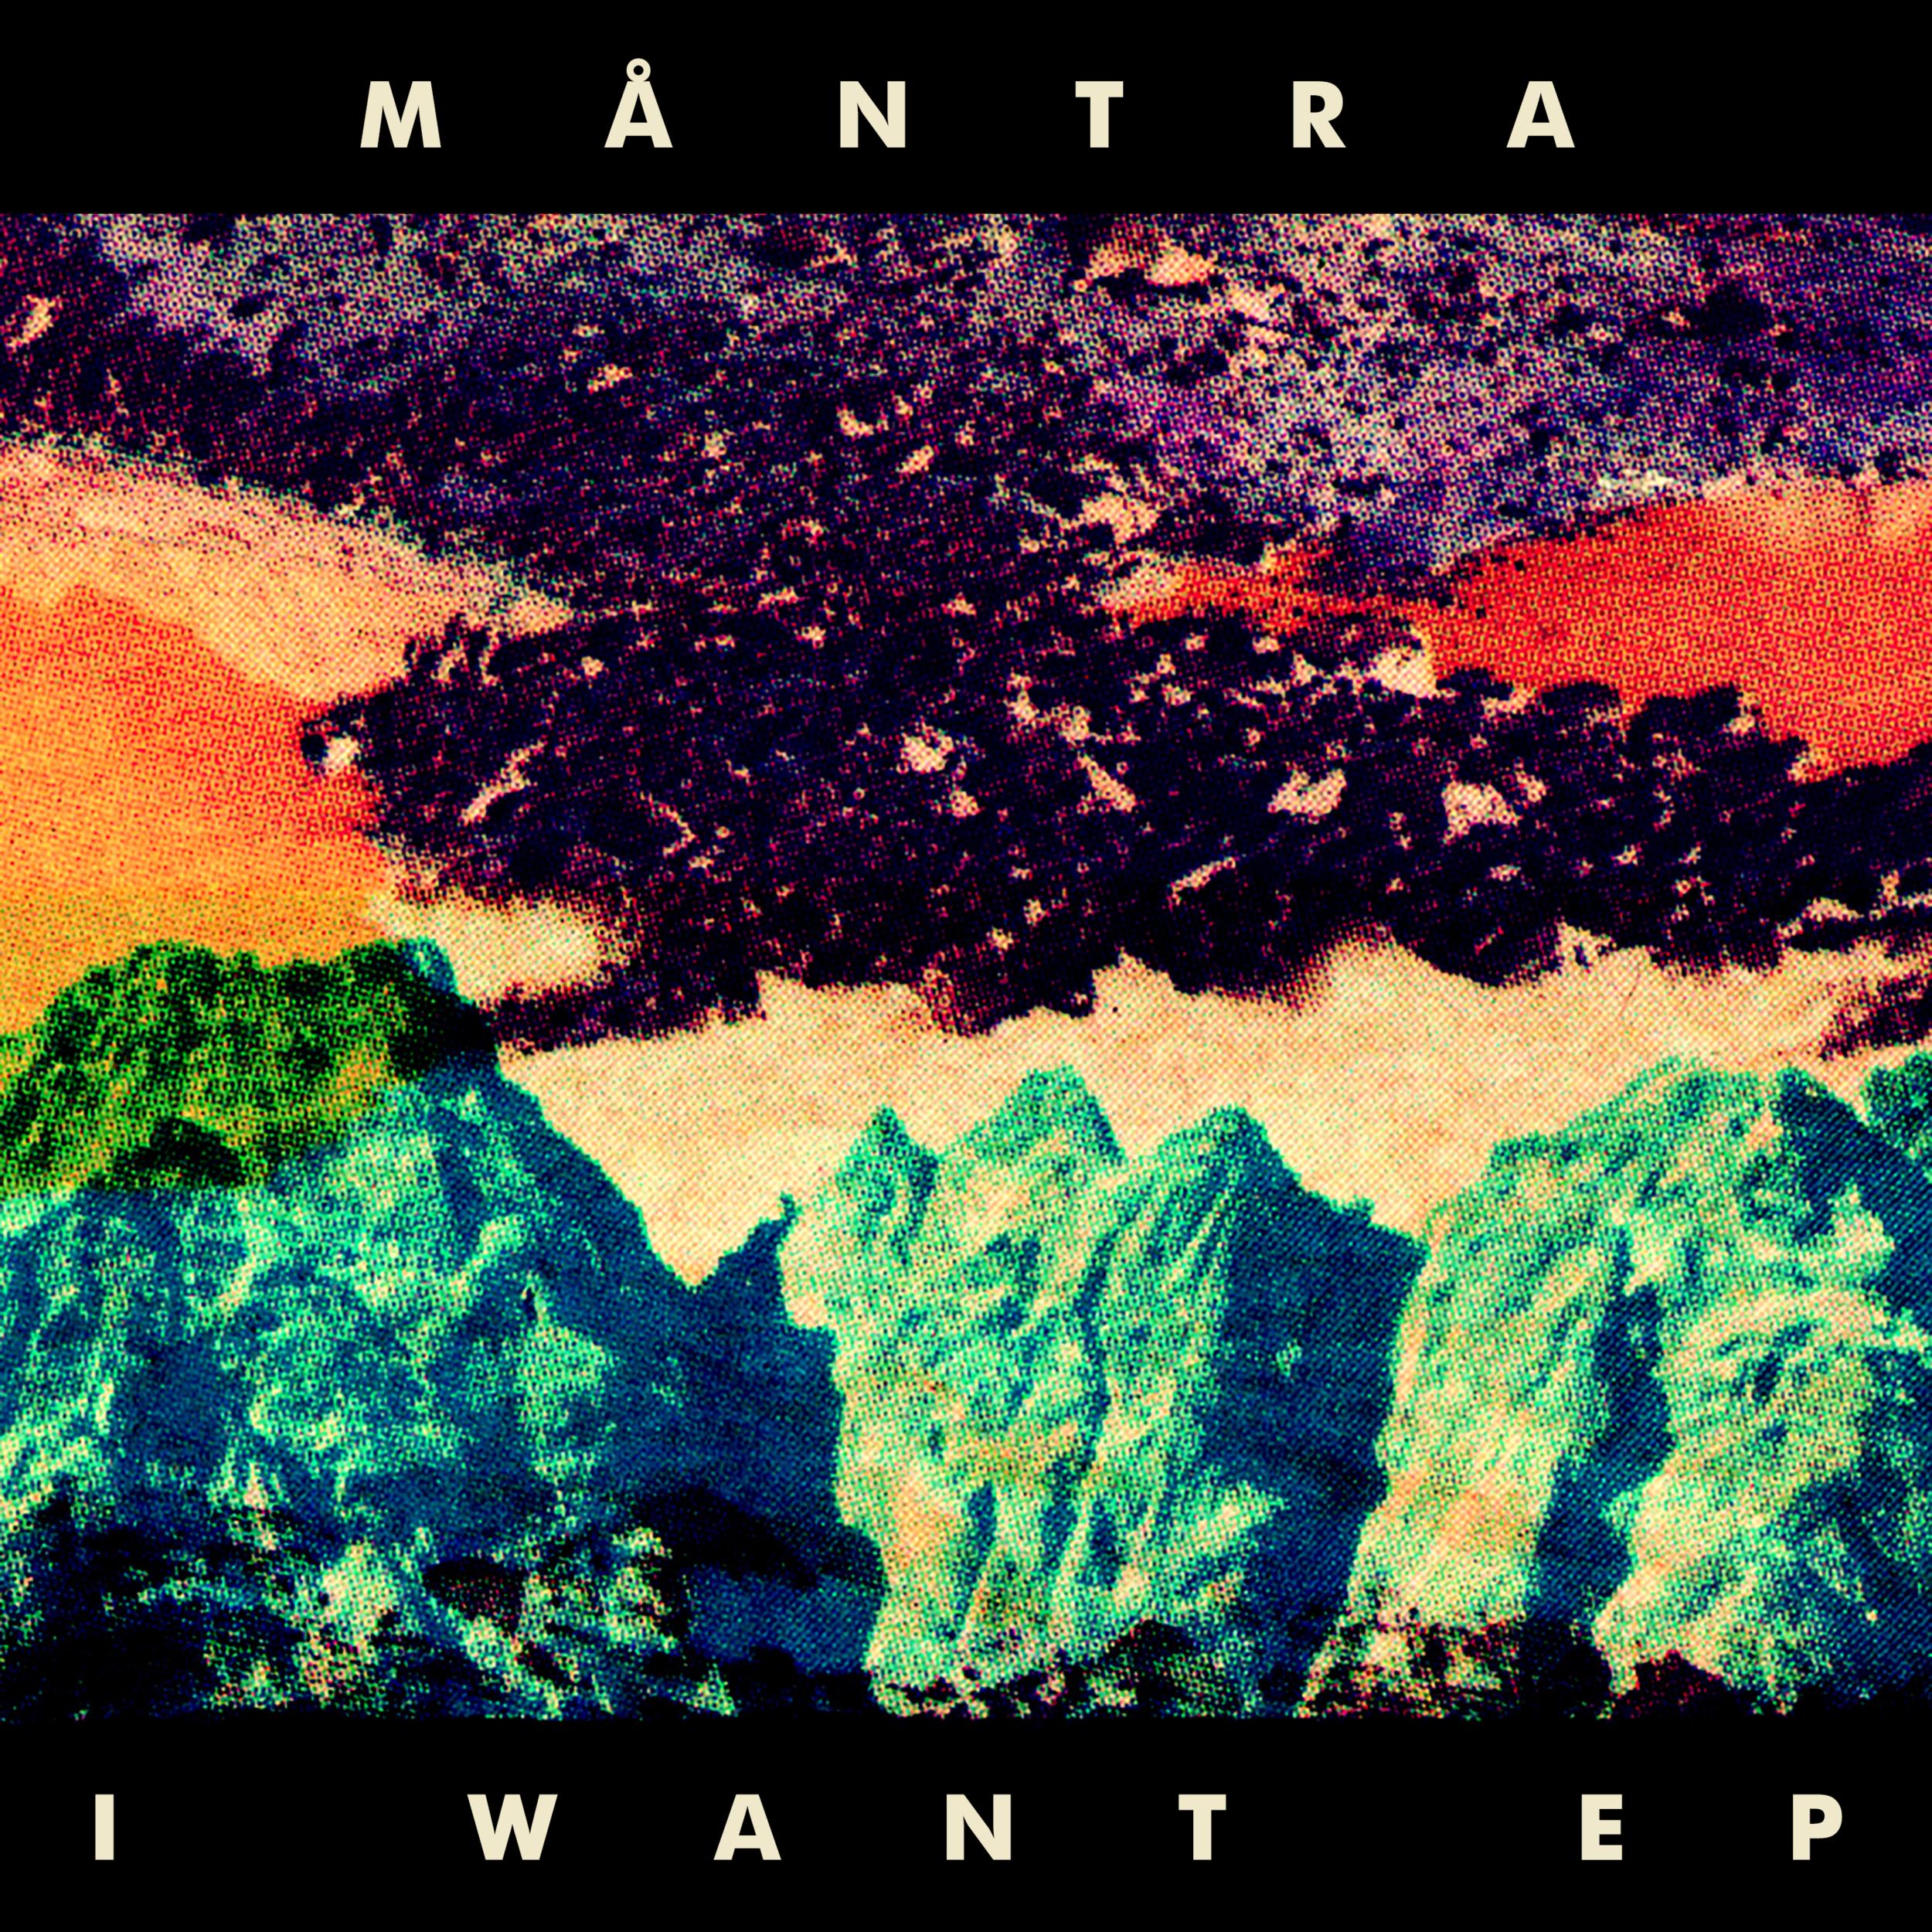 I Want EP artwork.png